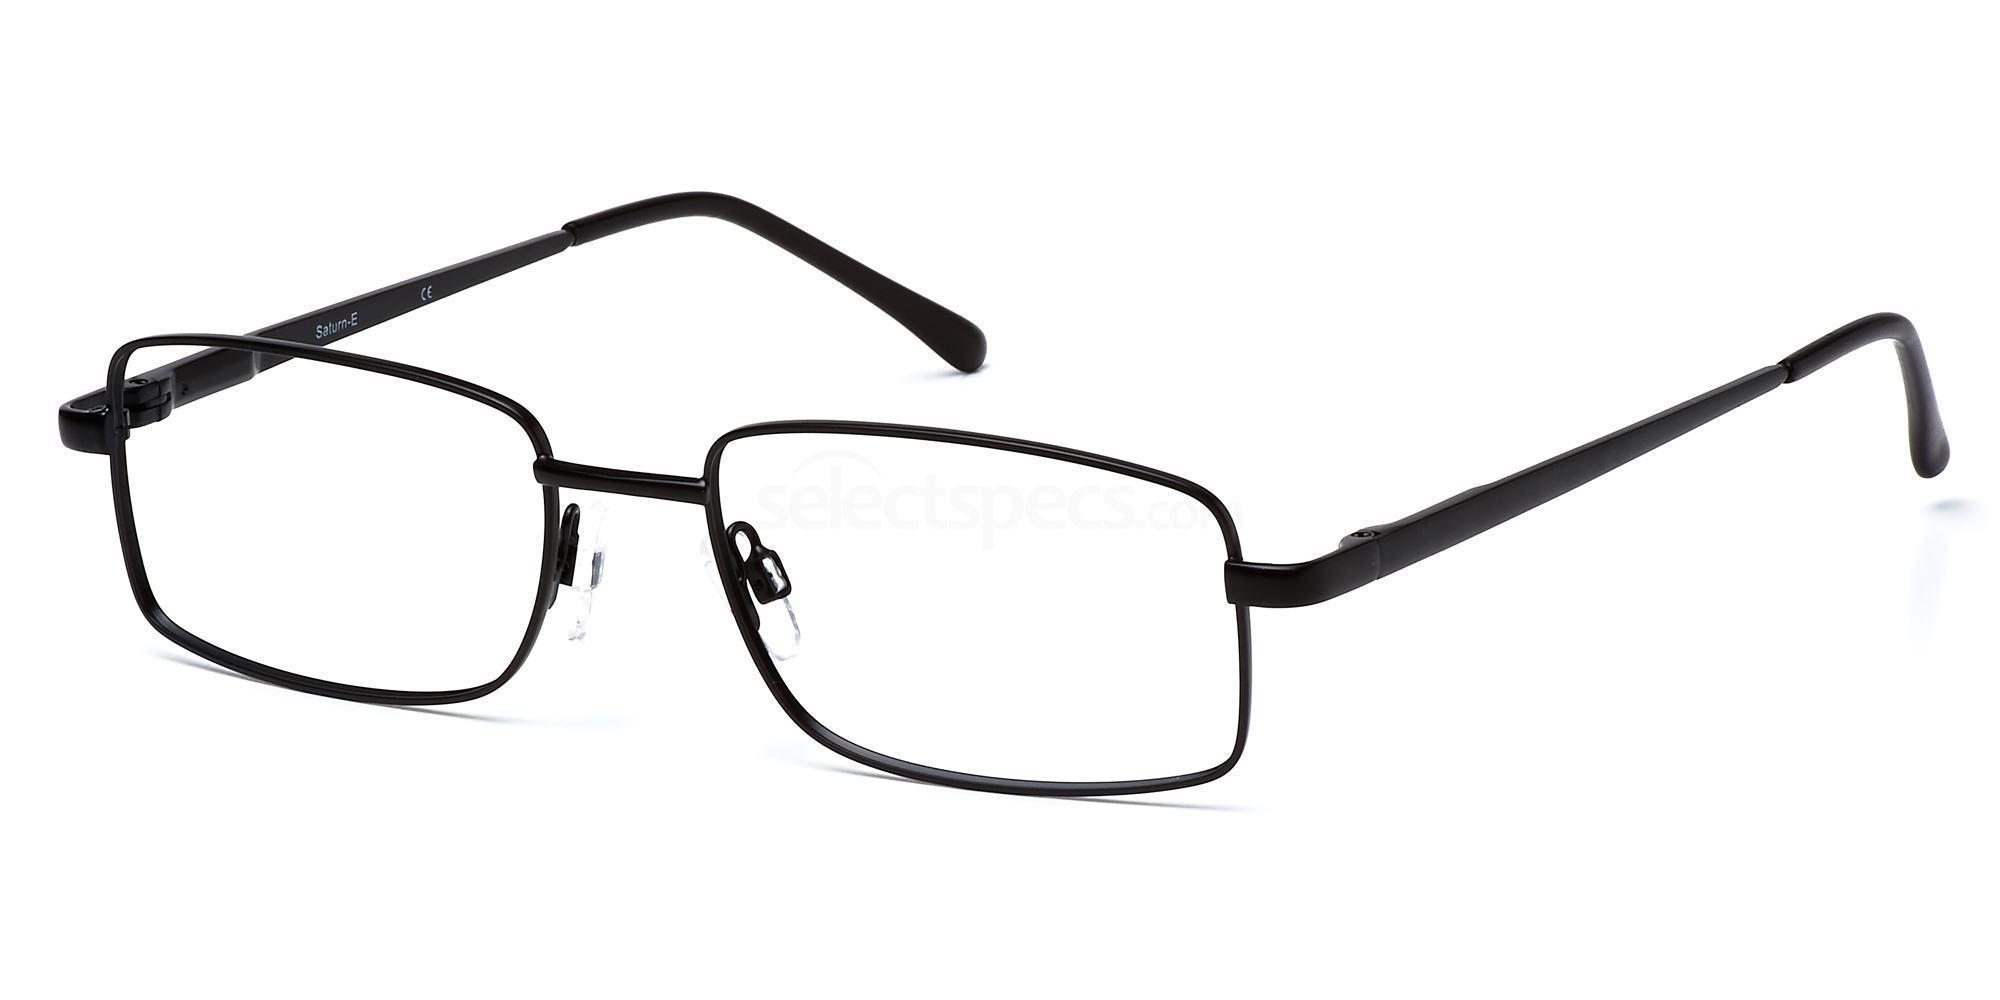 C1 SATE Glasses, Saturn